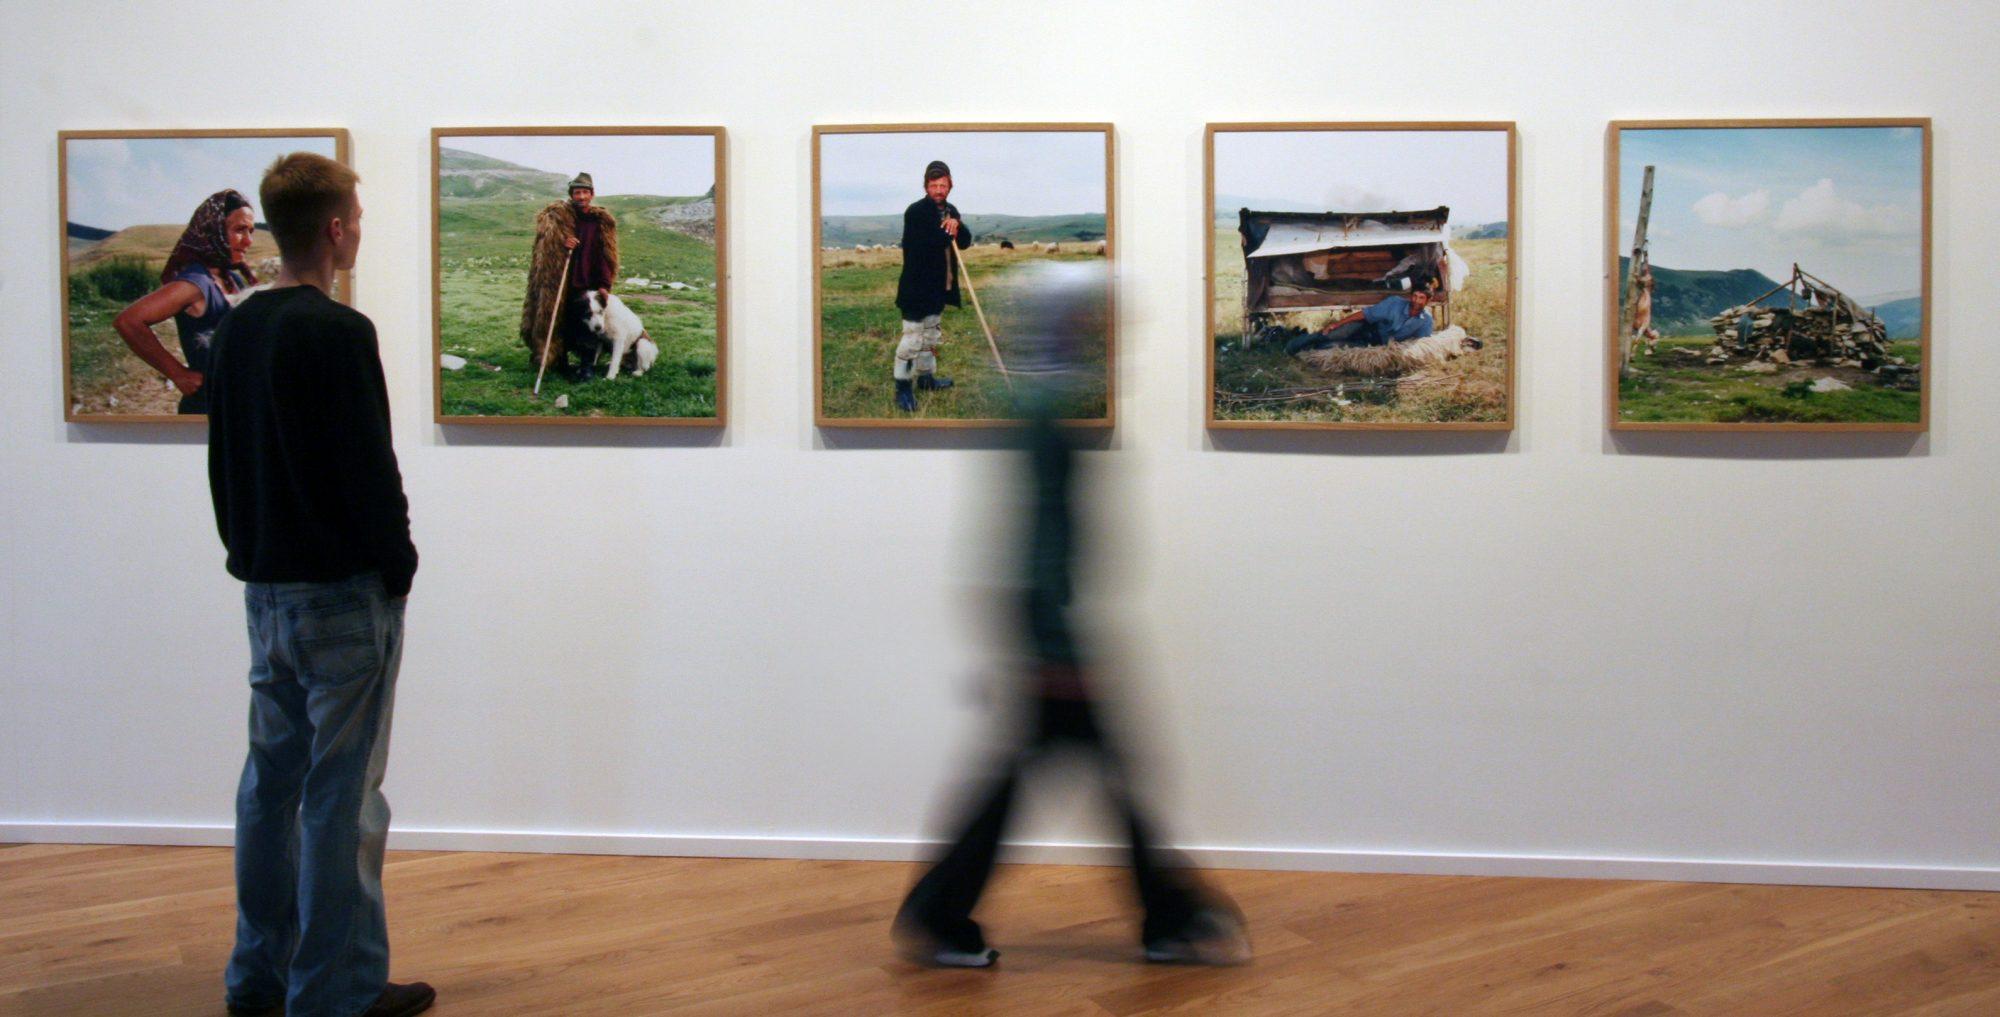 Install shot from Tessa Bunnies exhibition